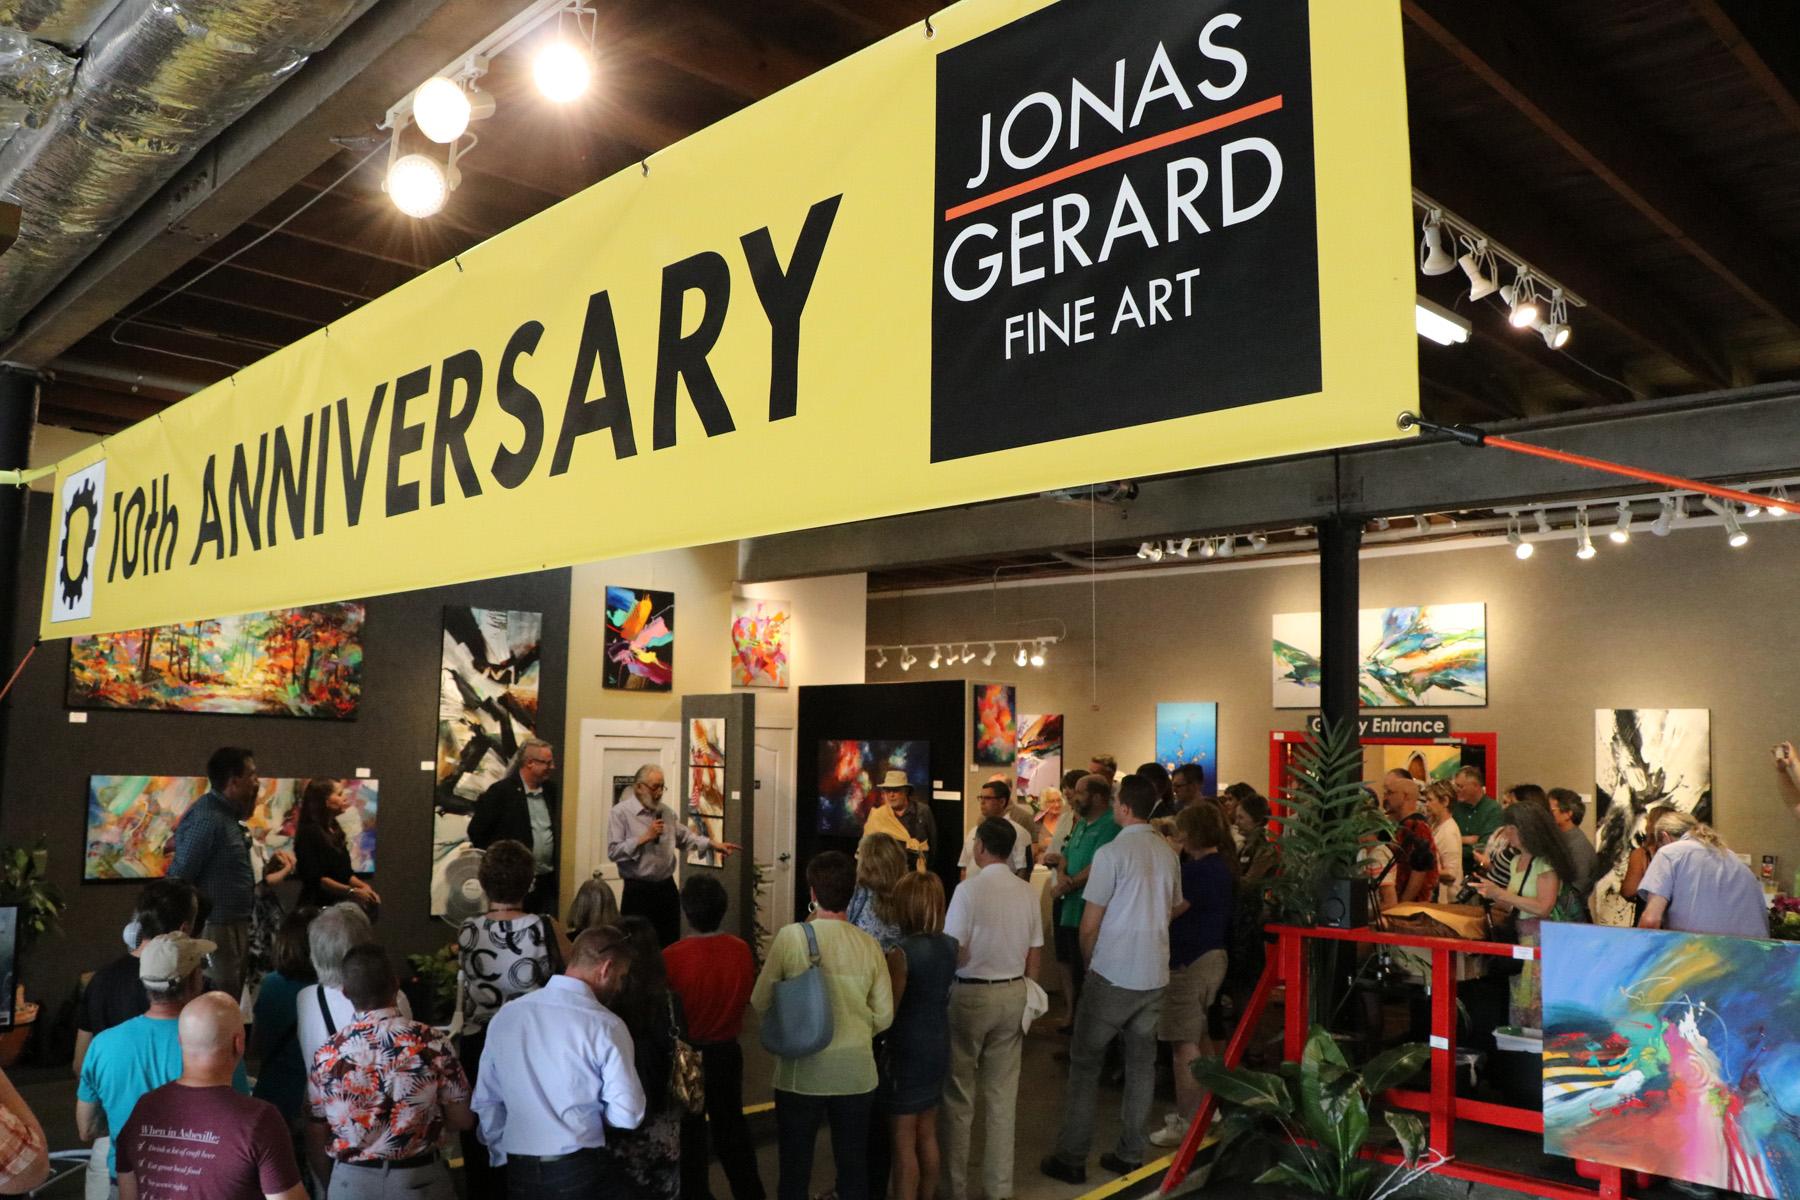 Jonas Gerard Fine Art celebrates 10 years in Asheville.